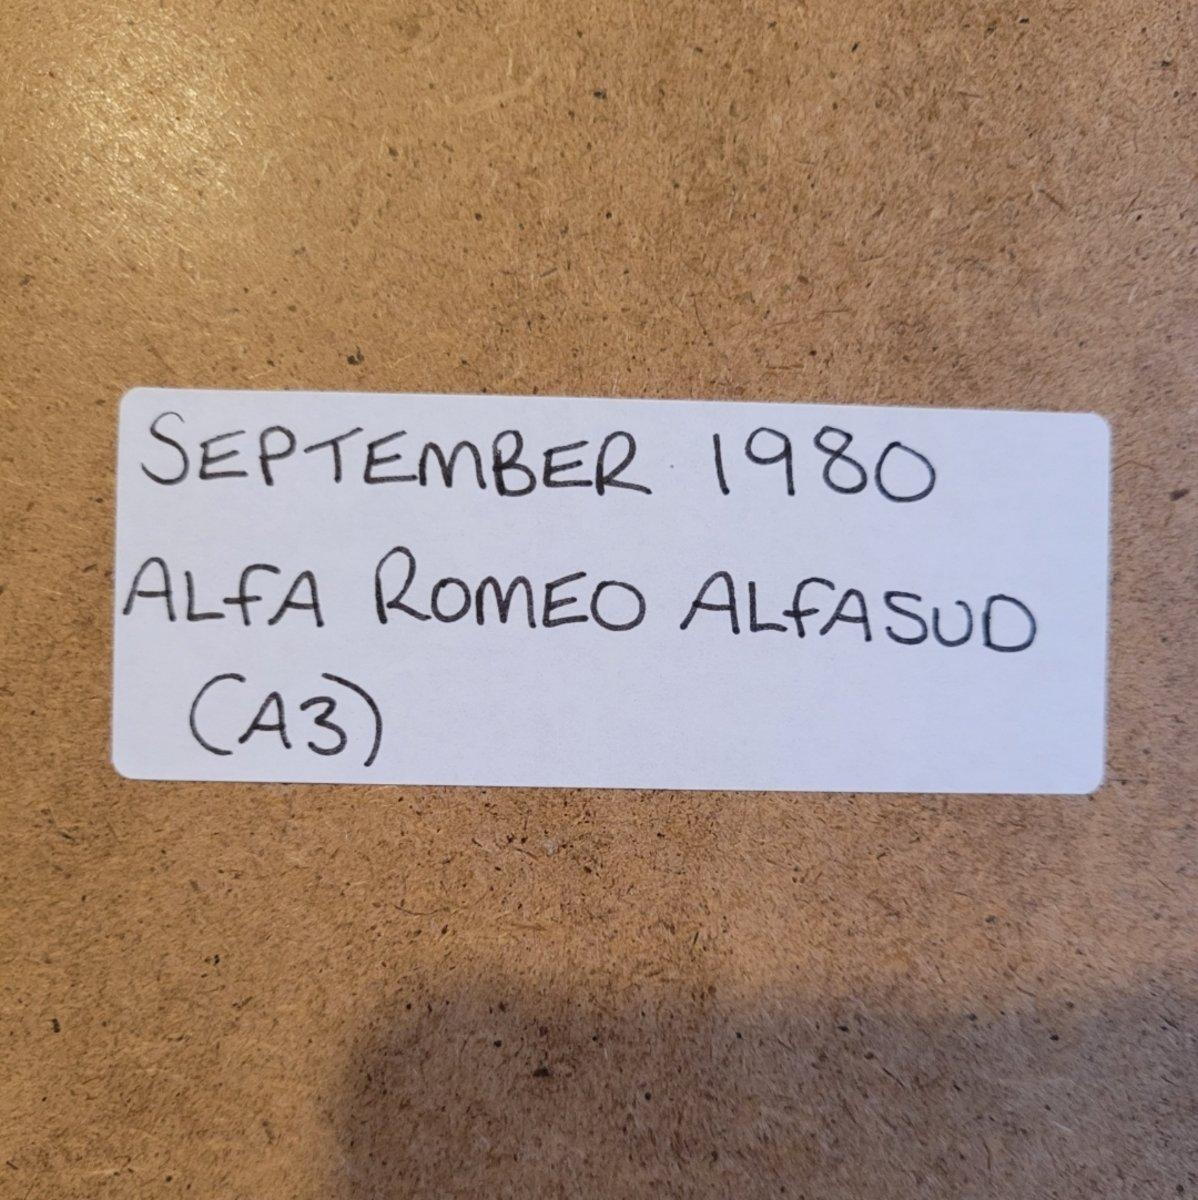 1985 Original 1980 Alfasud Framed Advert For Sale (picture 2 of 3)